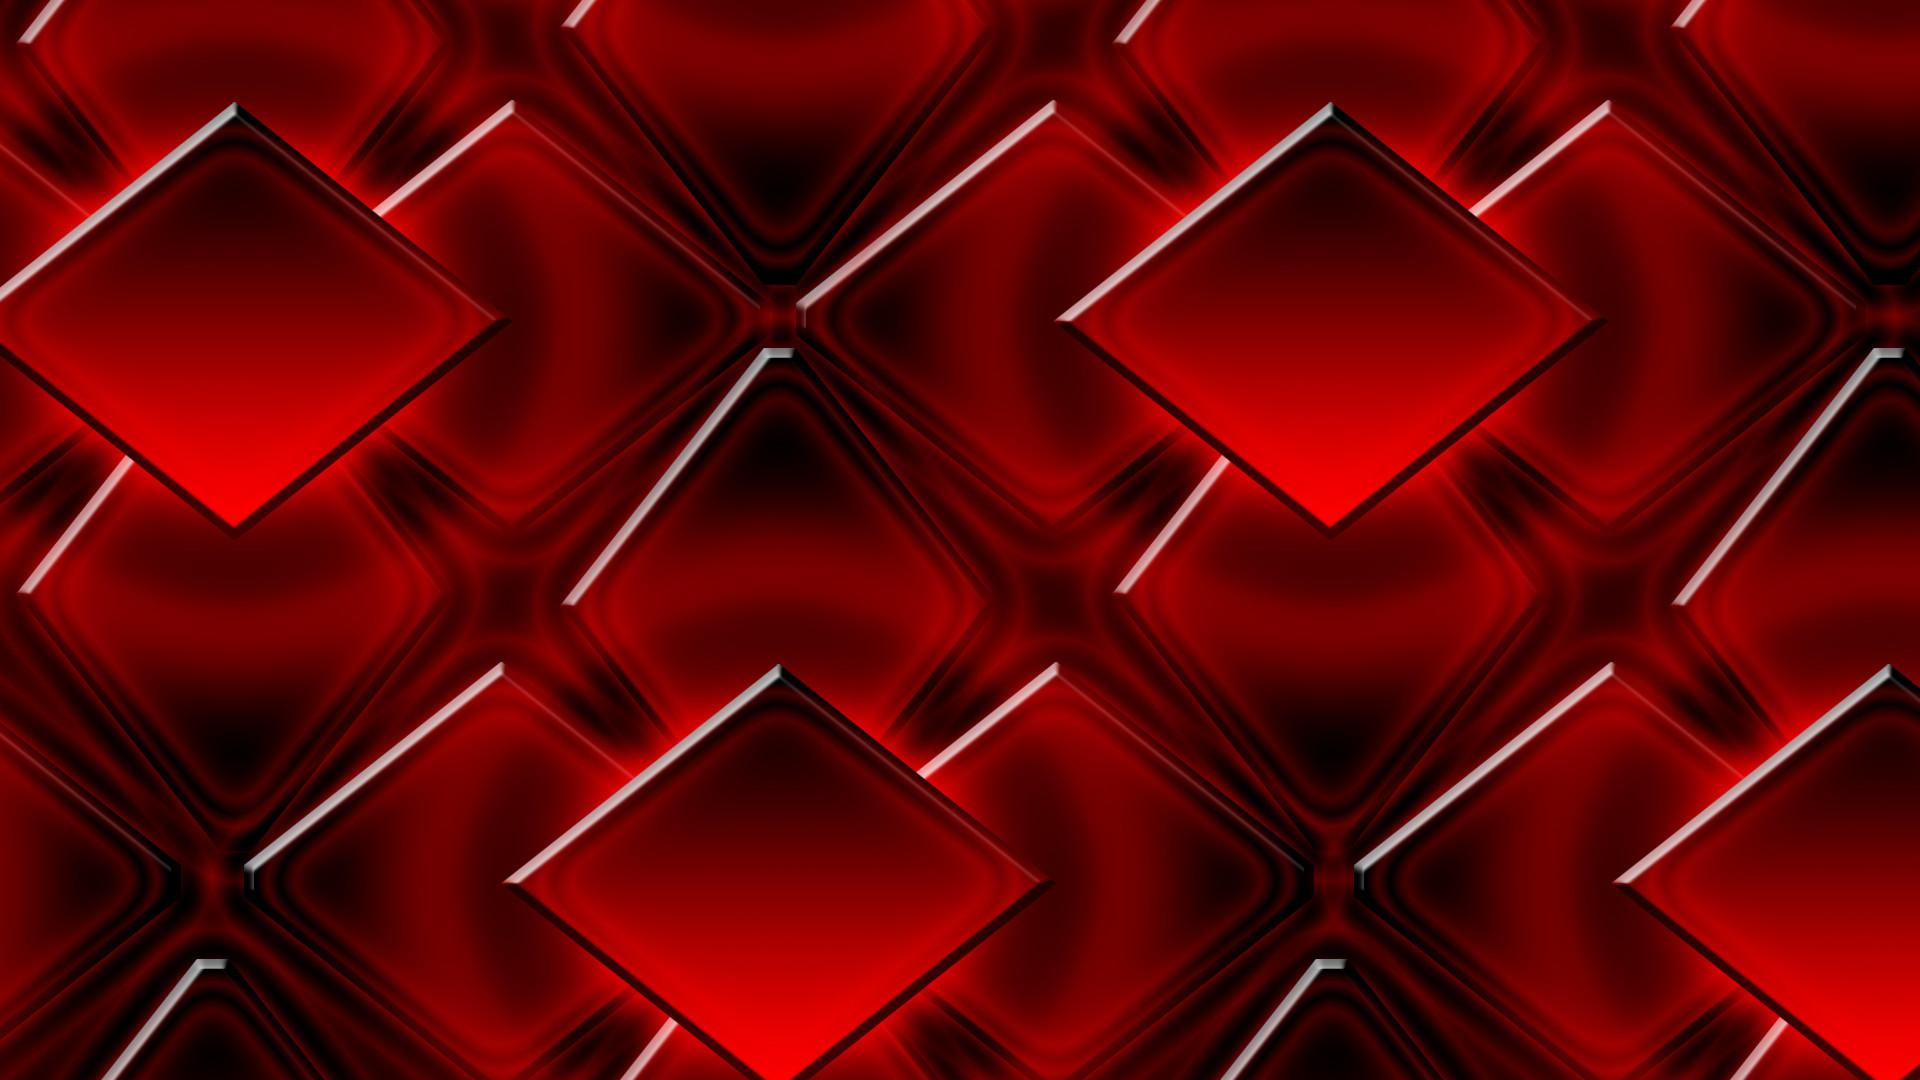 Hipster Fall Desktop Wallpaper Diamond Pattern Wallpapers Hd Pixelstalk Net